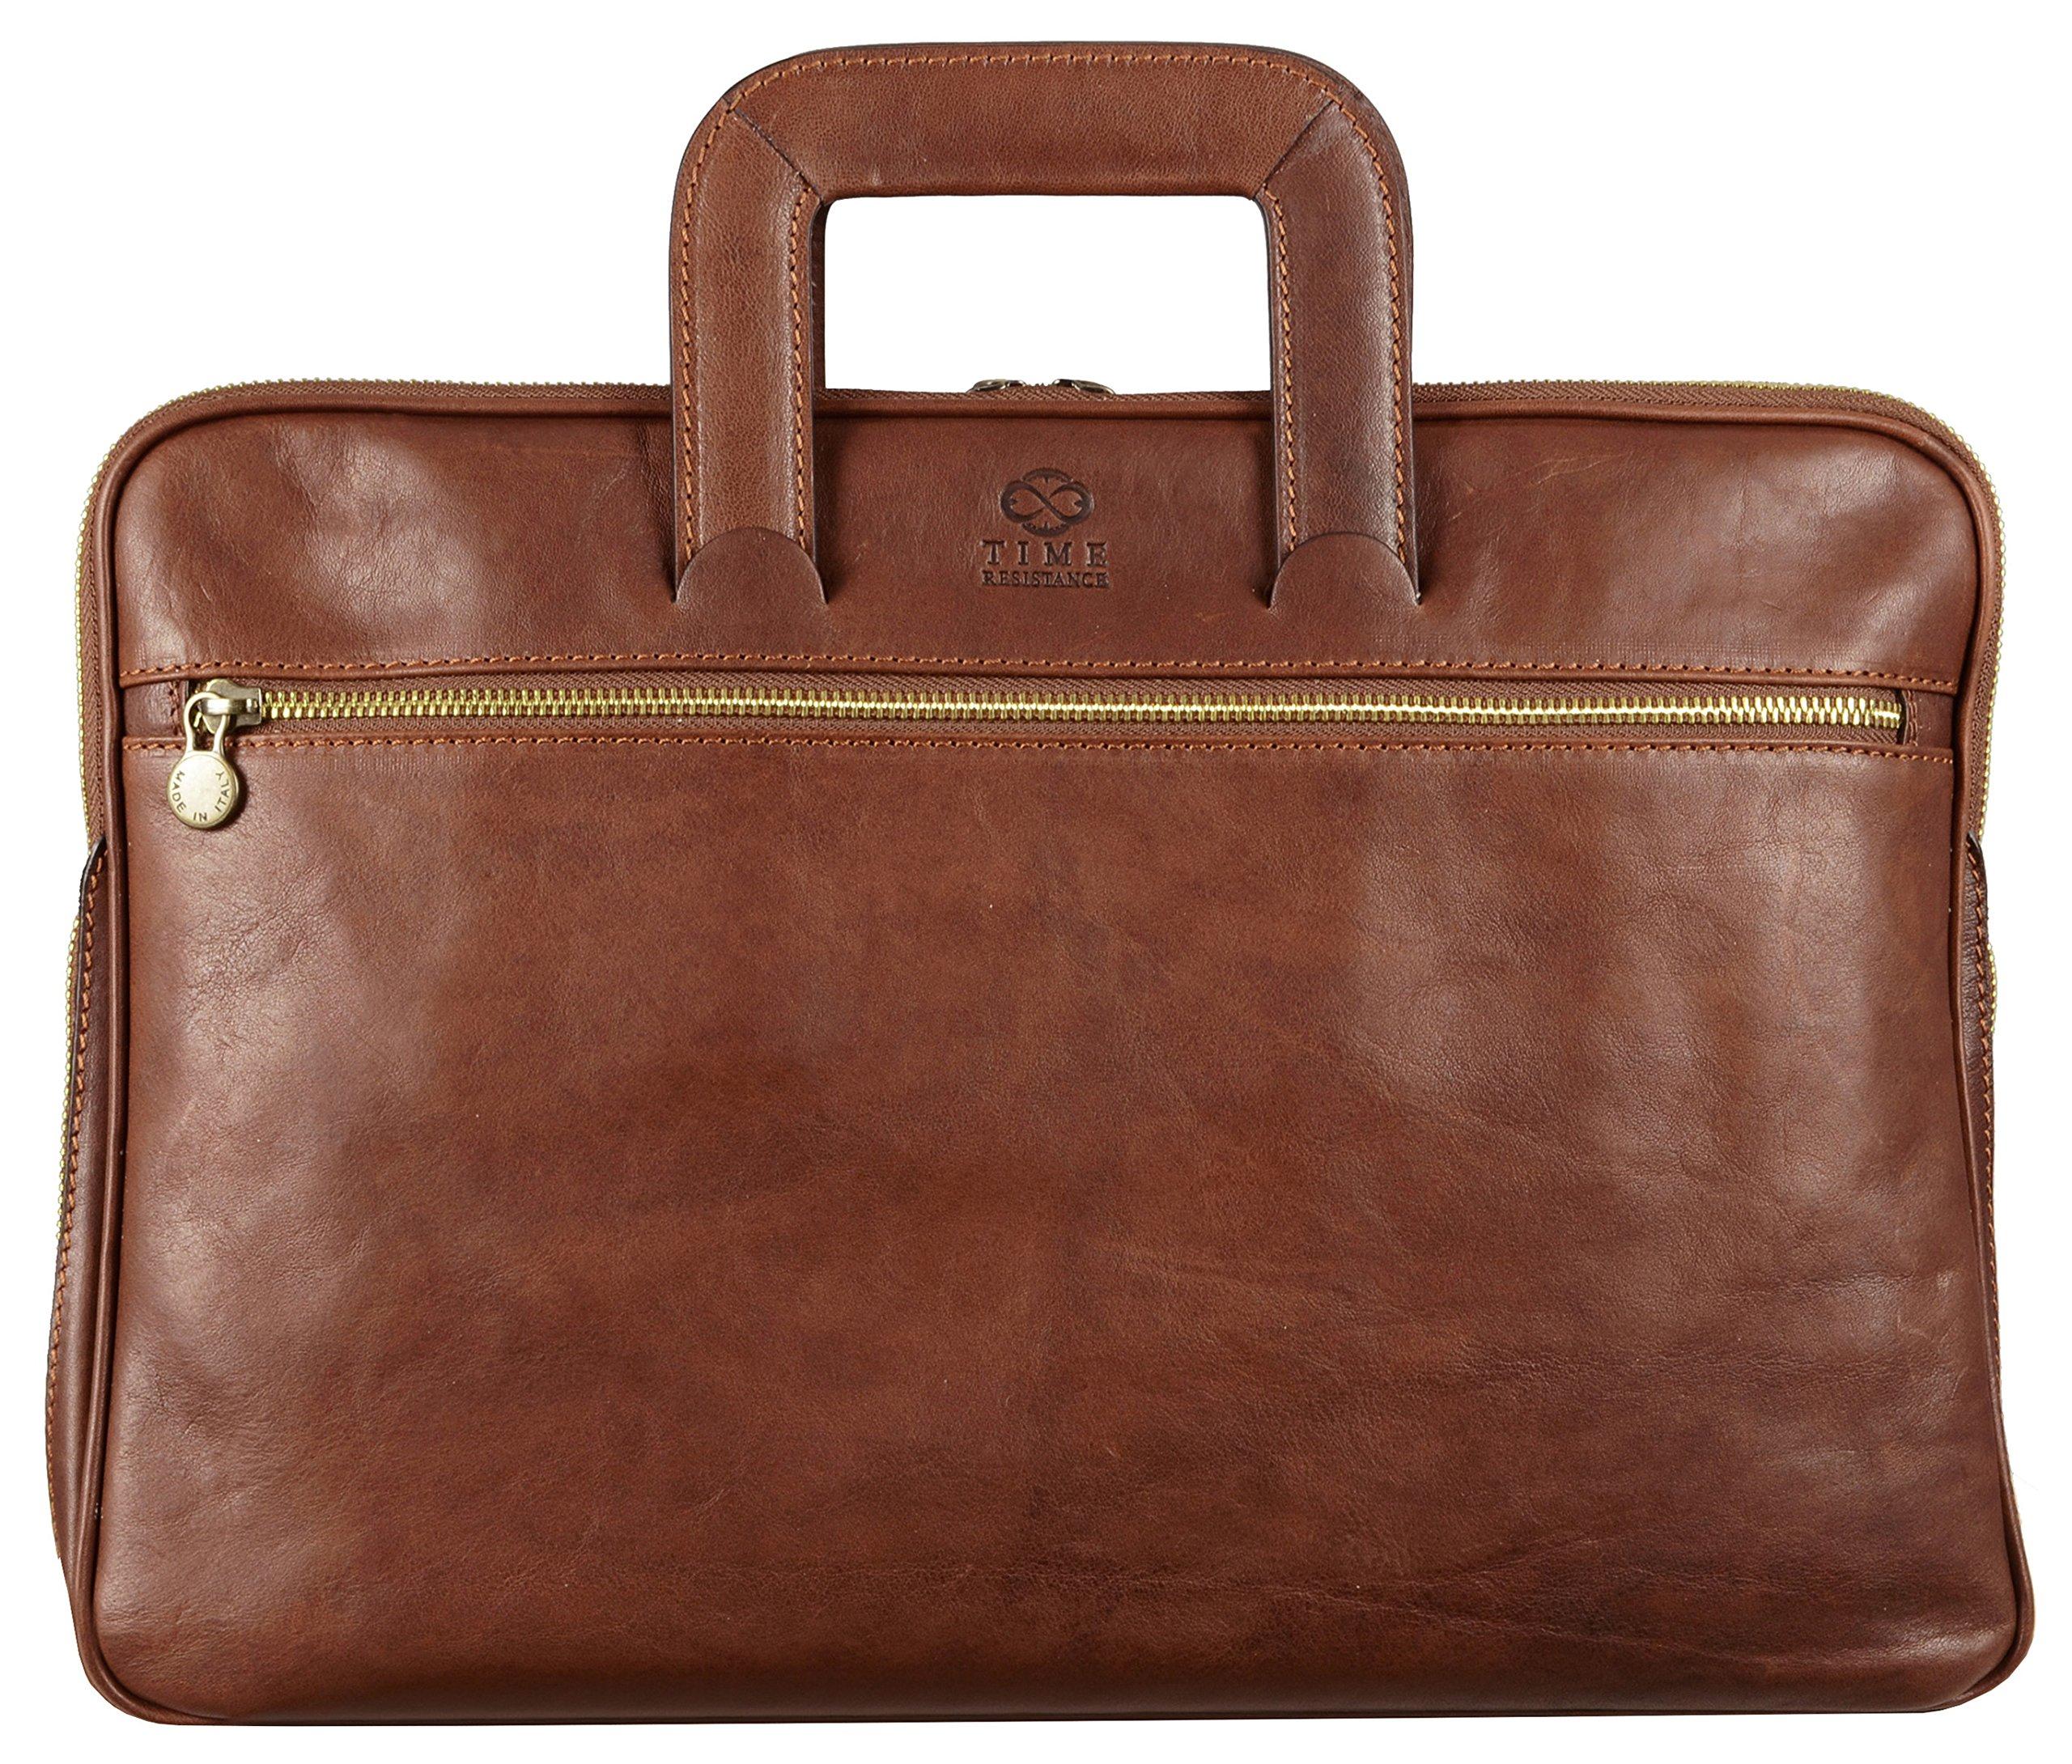 Brown Genuine Leather Briefcase Laptop Messenger Bag Unisex Medium Brown - Time Resistance